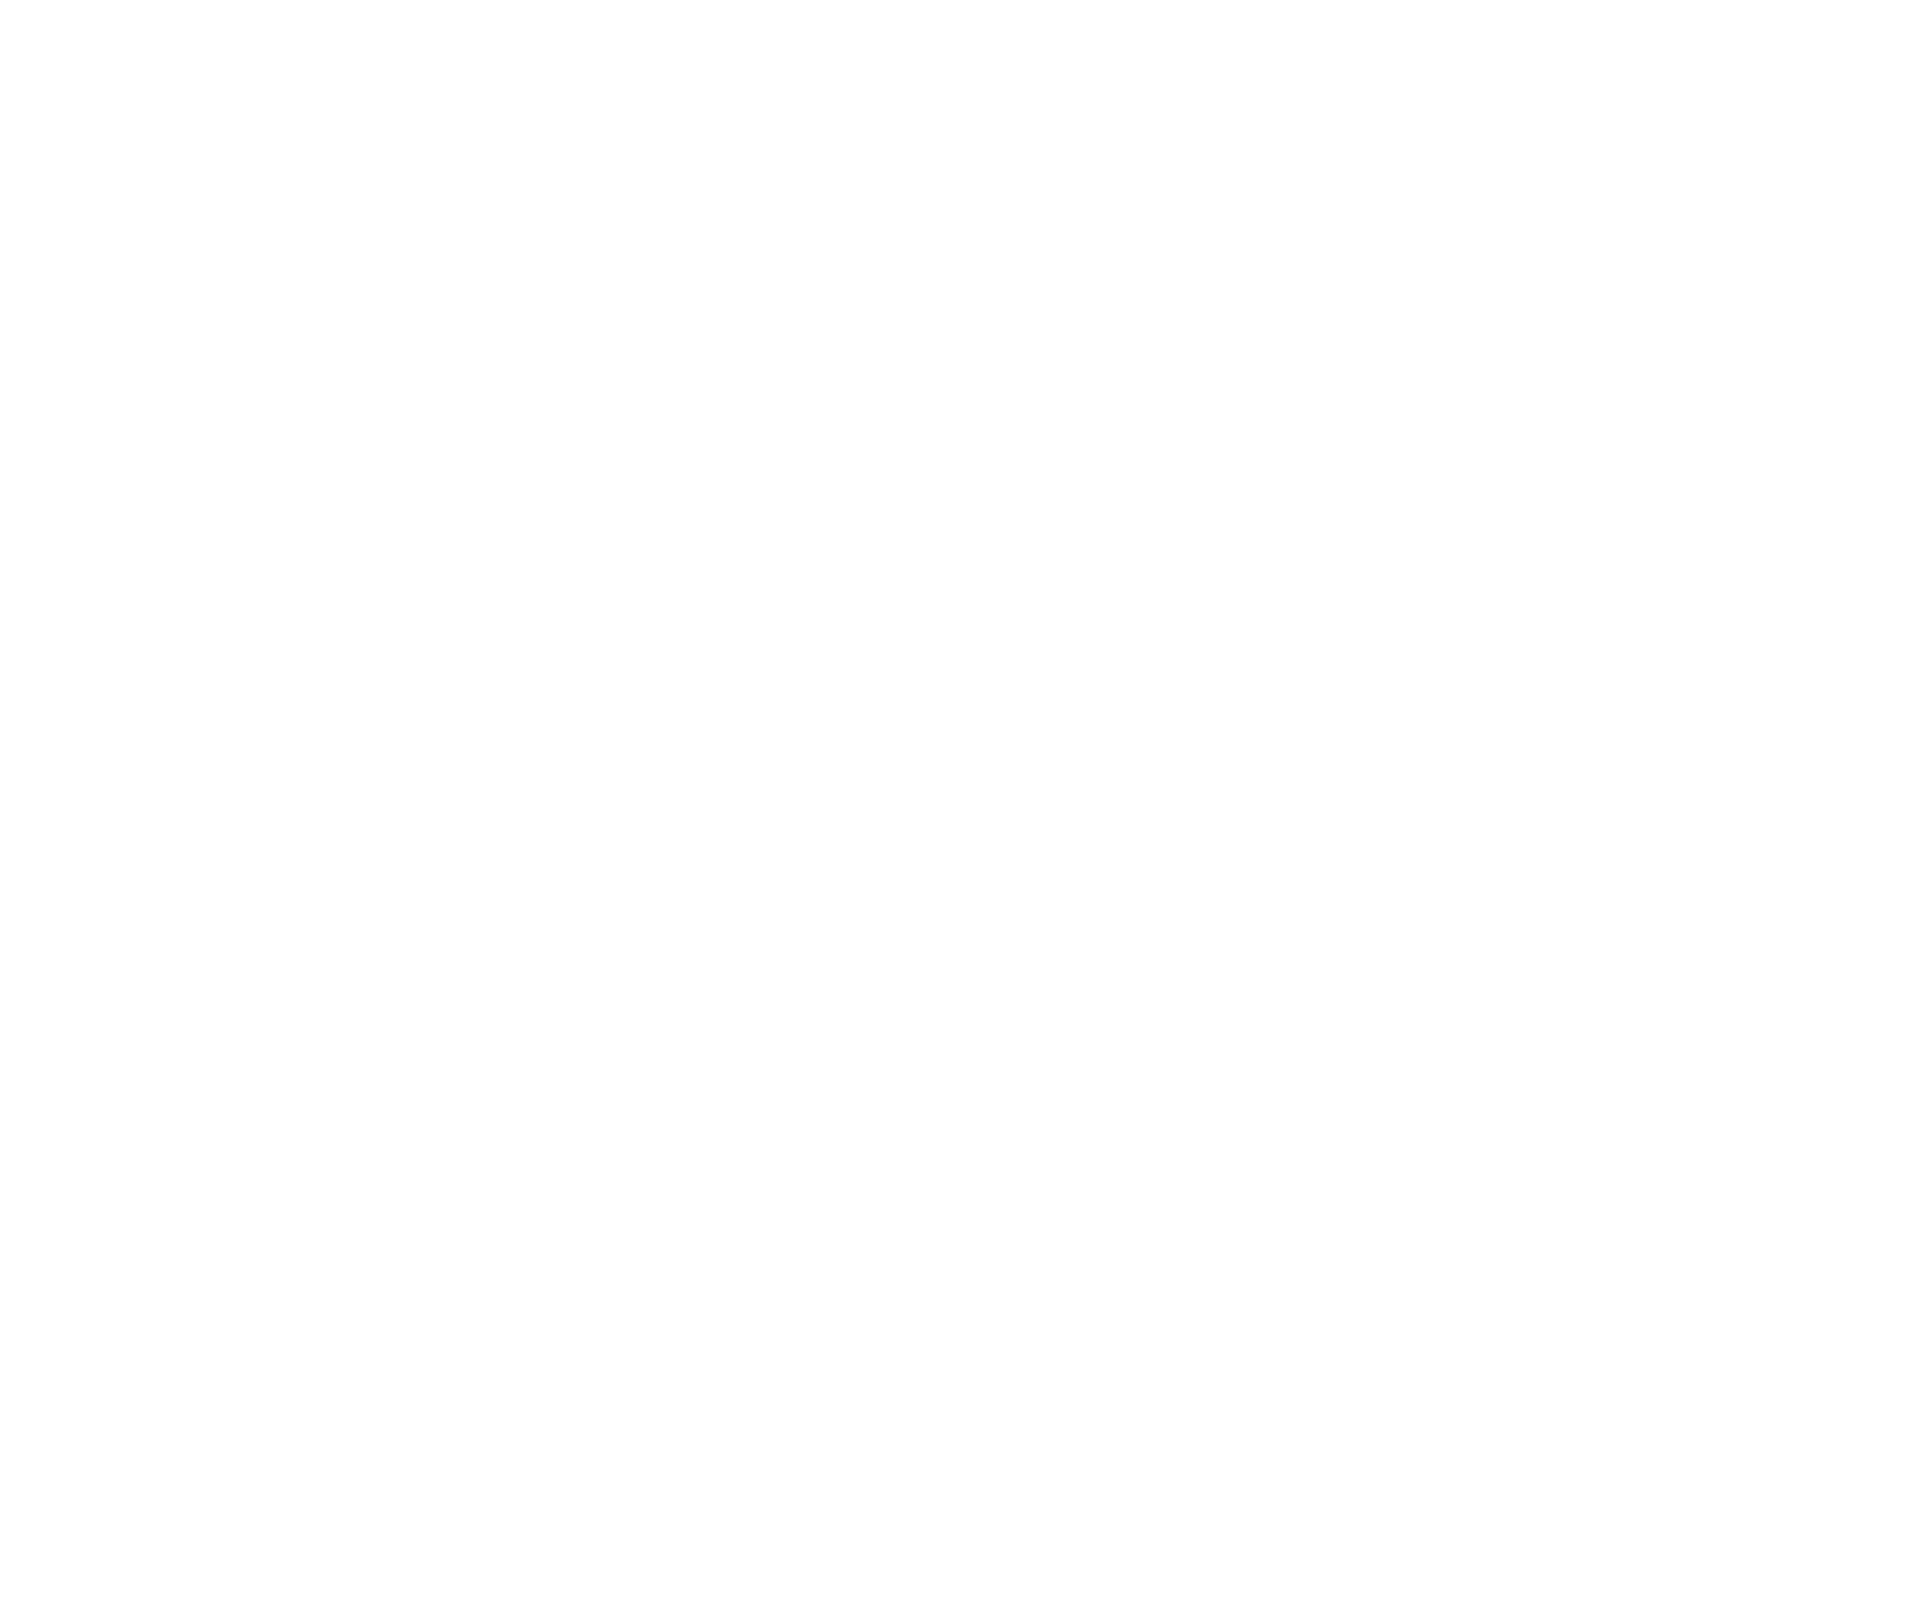 https://eqoxdgod6do.exactdn.com/wp-content/uploads/2021/02/Office3-scaled-e1612976929584.jpeg?strip=all&lossy=1&w=1920&ssl=1